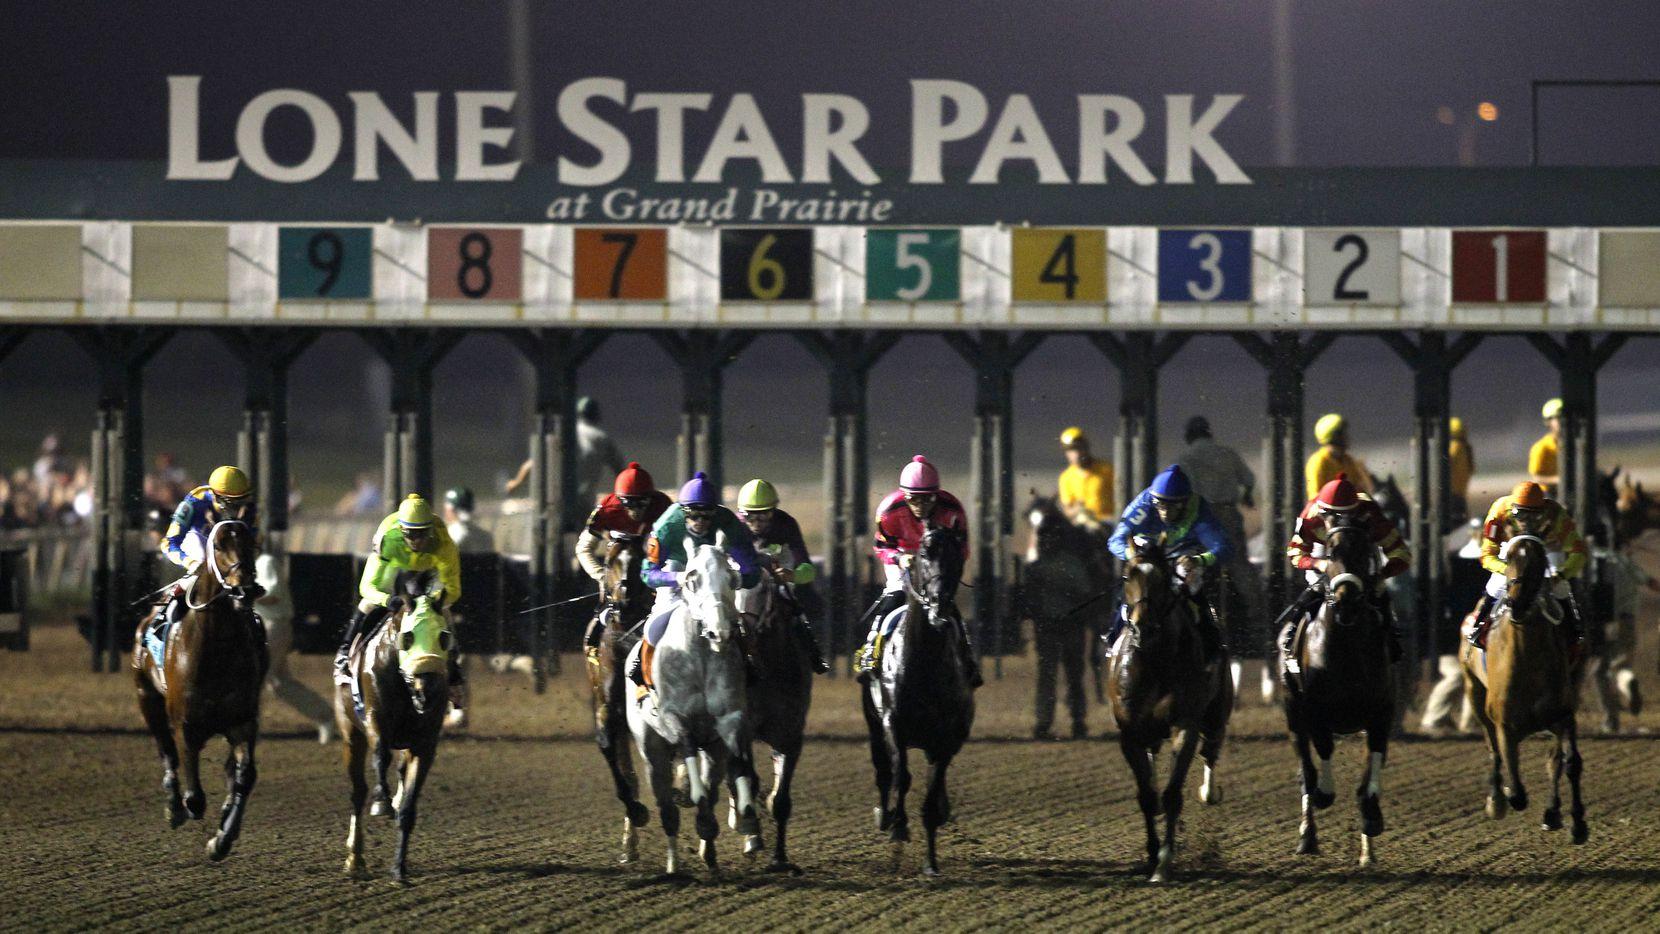 Lone Star Park will kick off the spring race season next week.